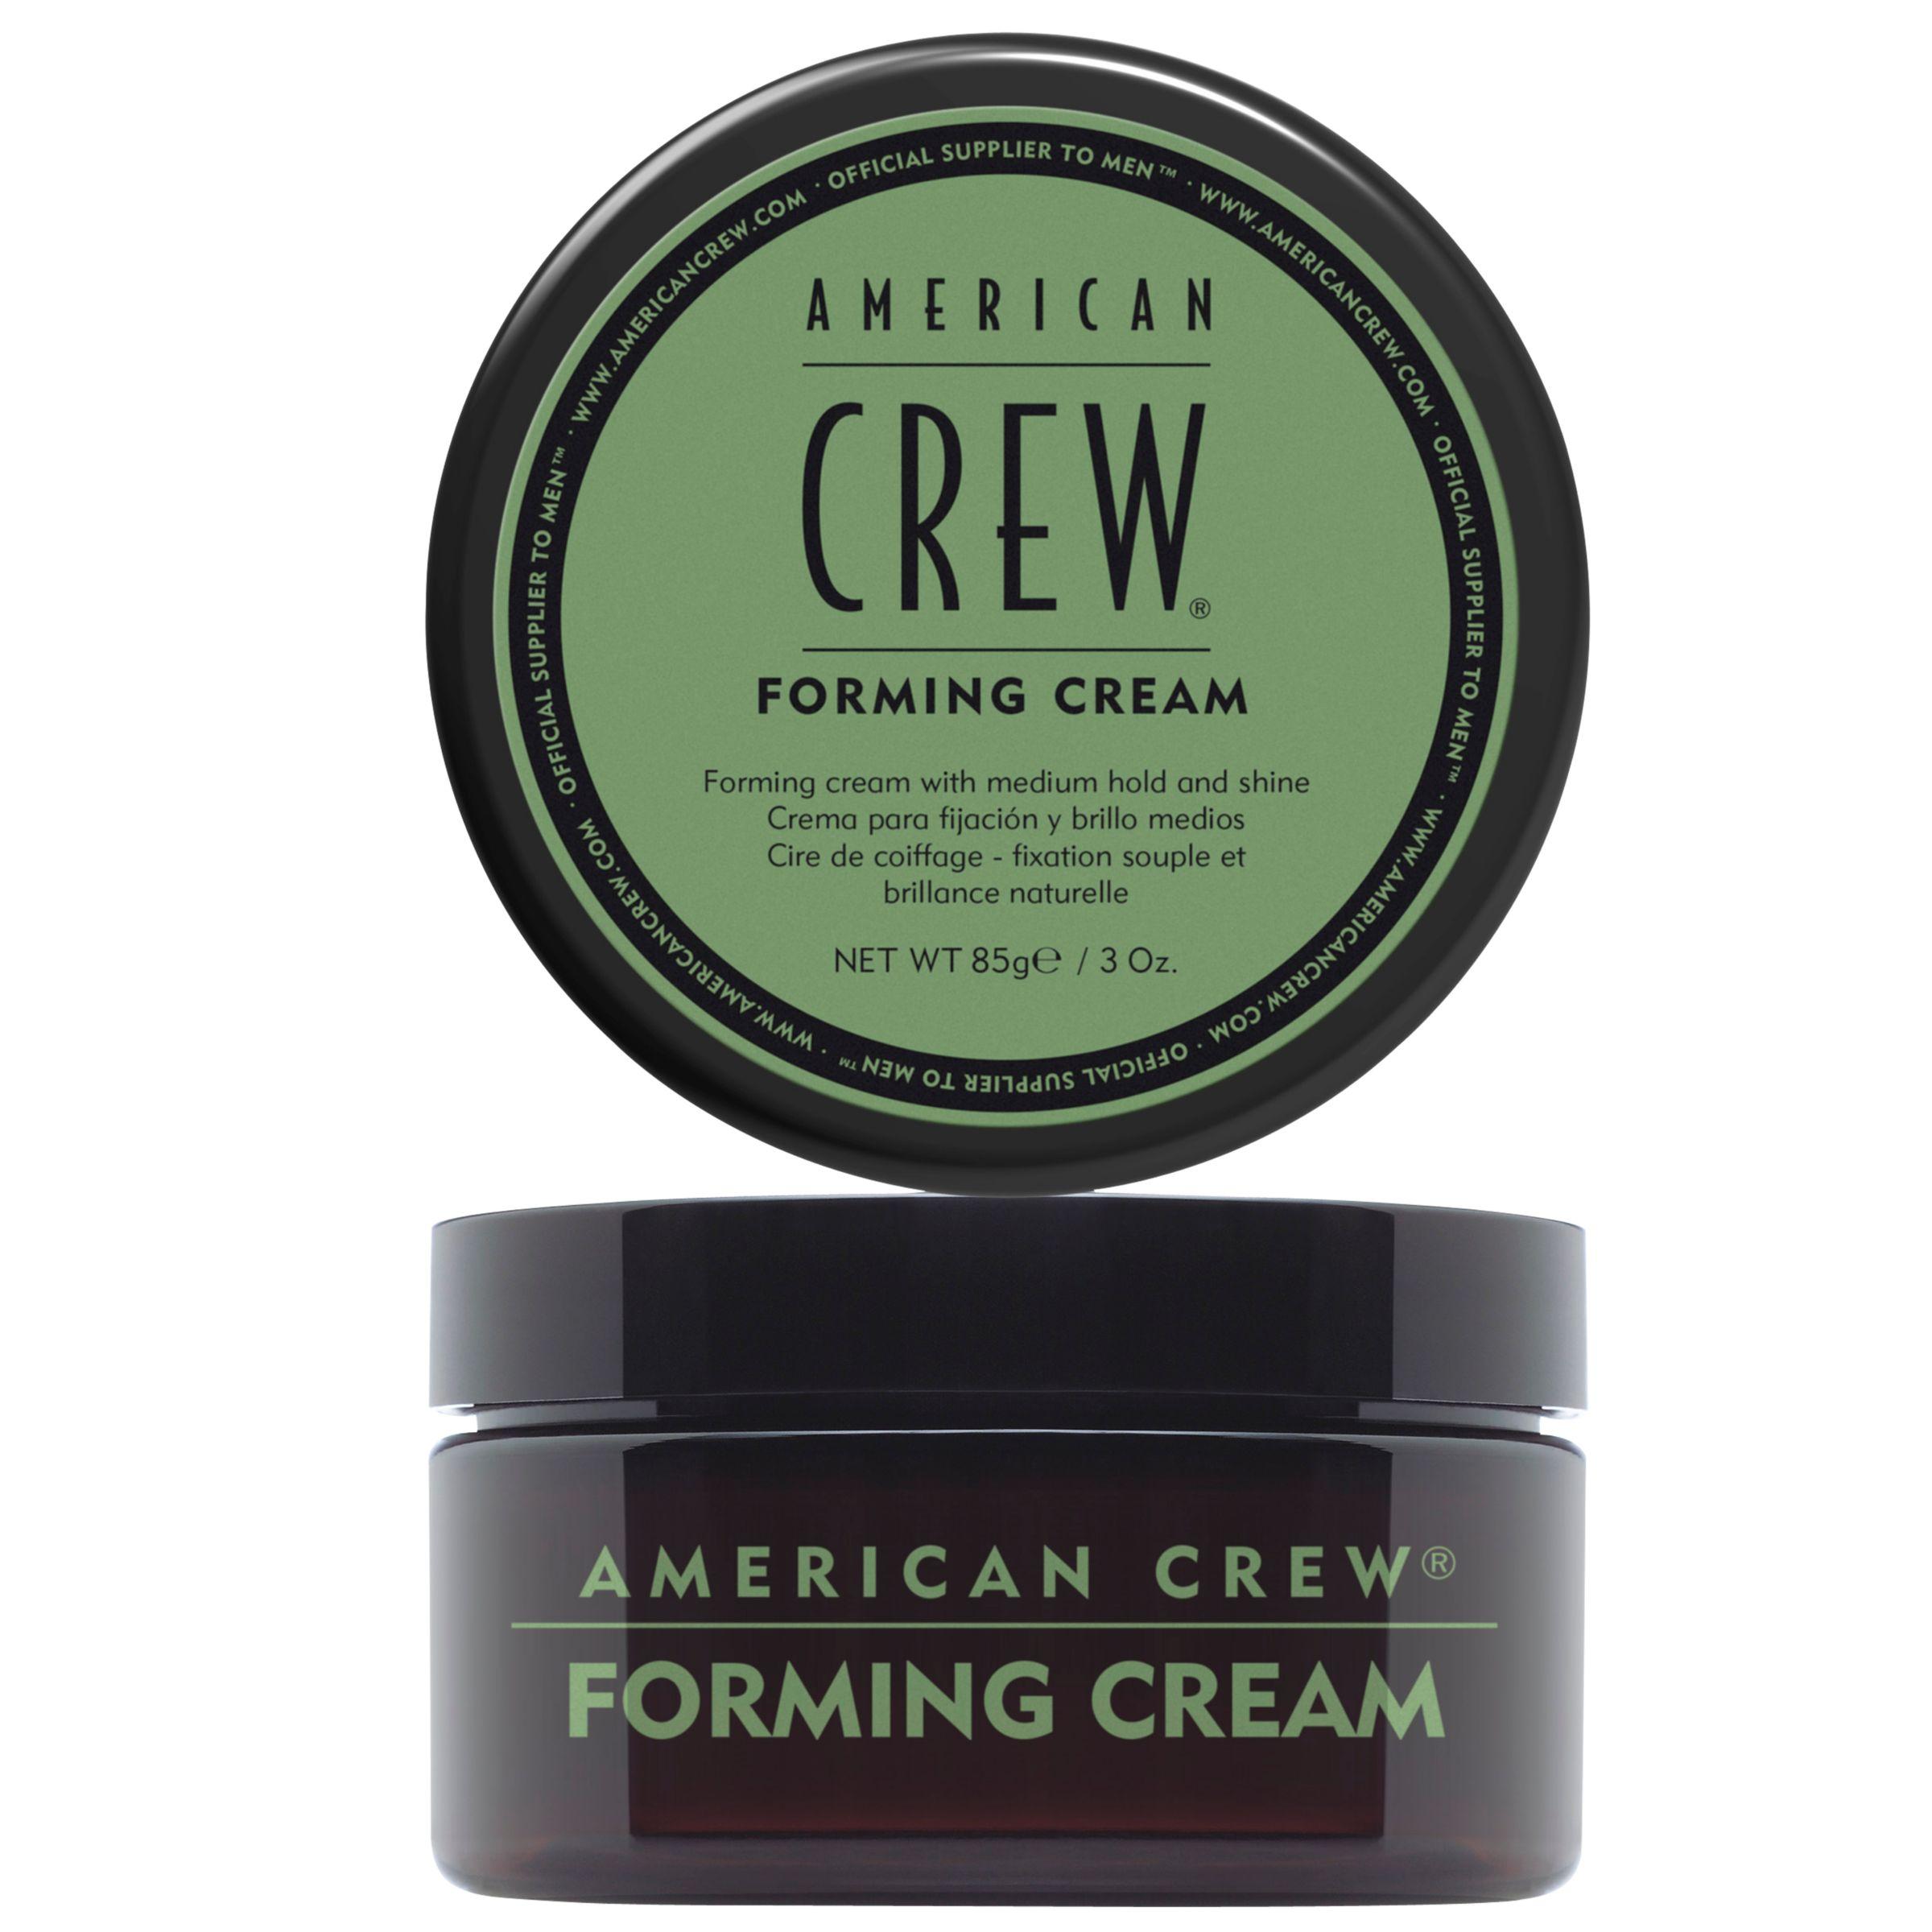 American Crew American Crew Forming Cream, 85g